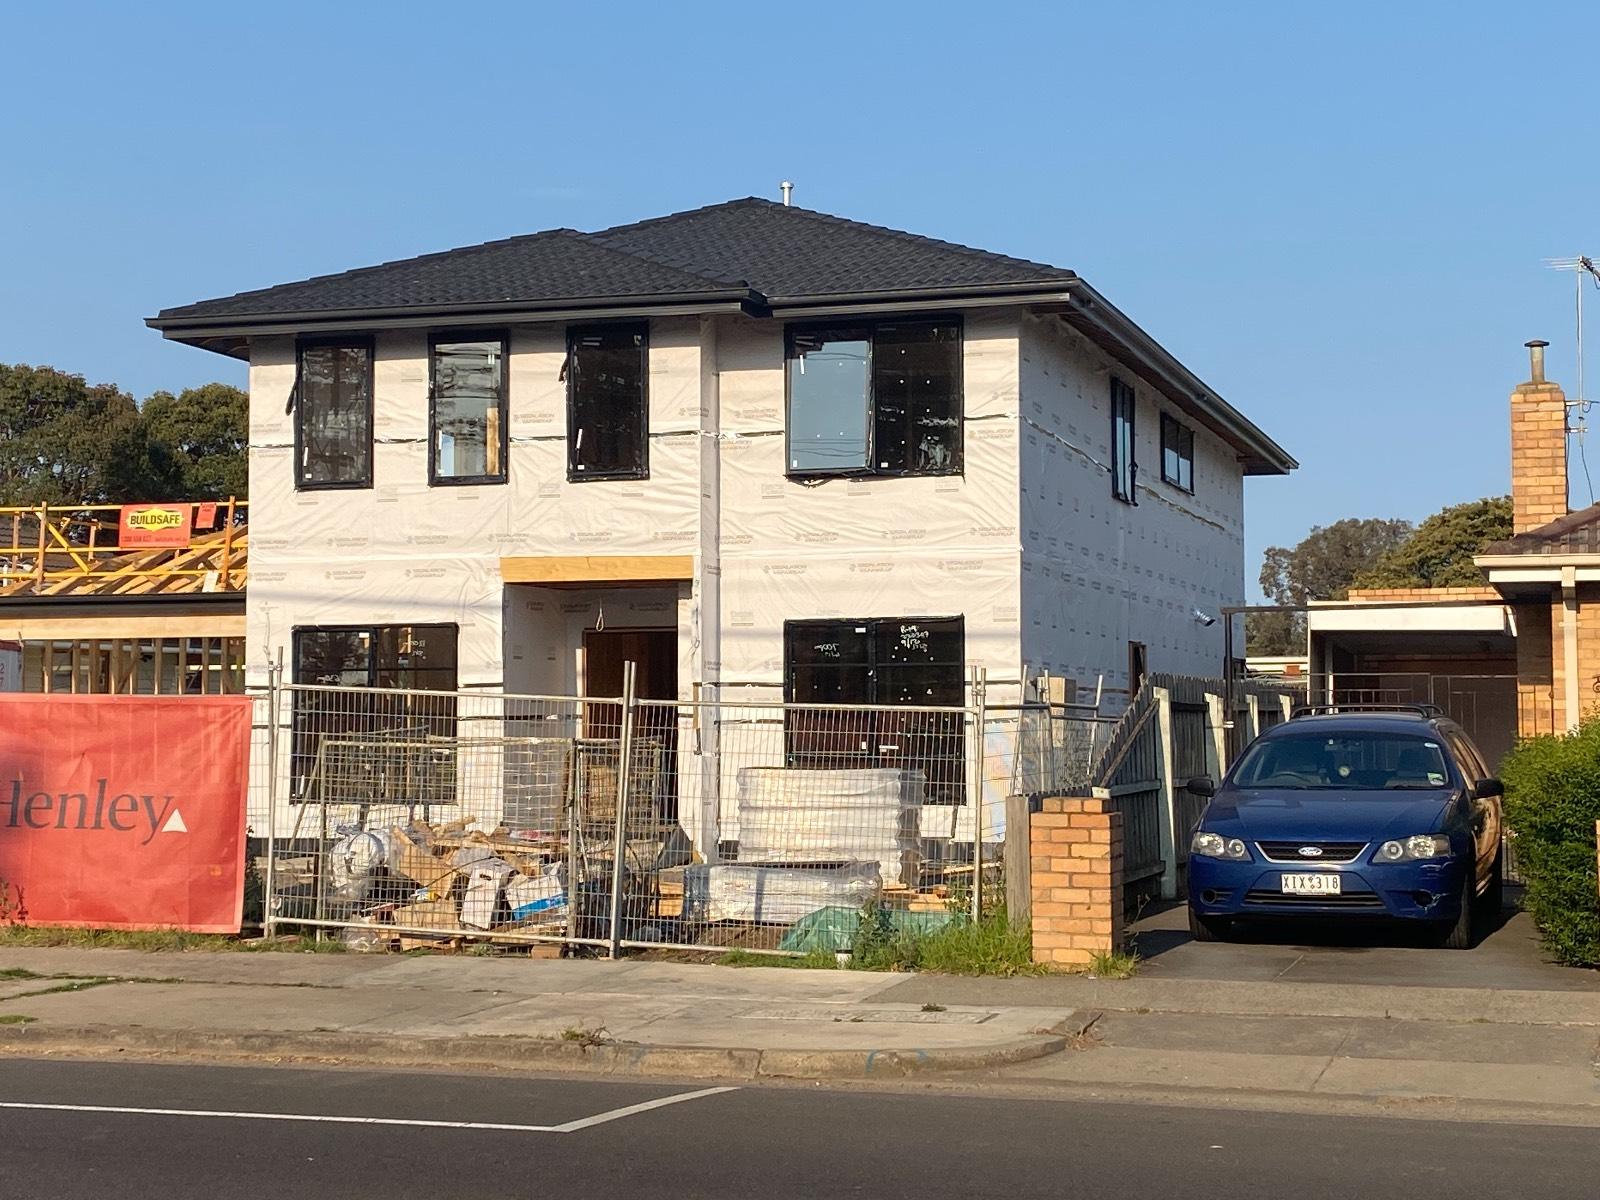 Henley Electra 35 Building Altona 2019 - Knock Down rebuild